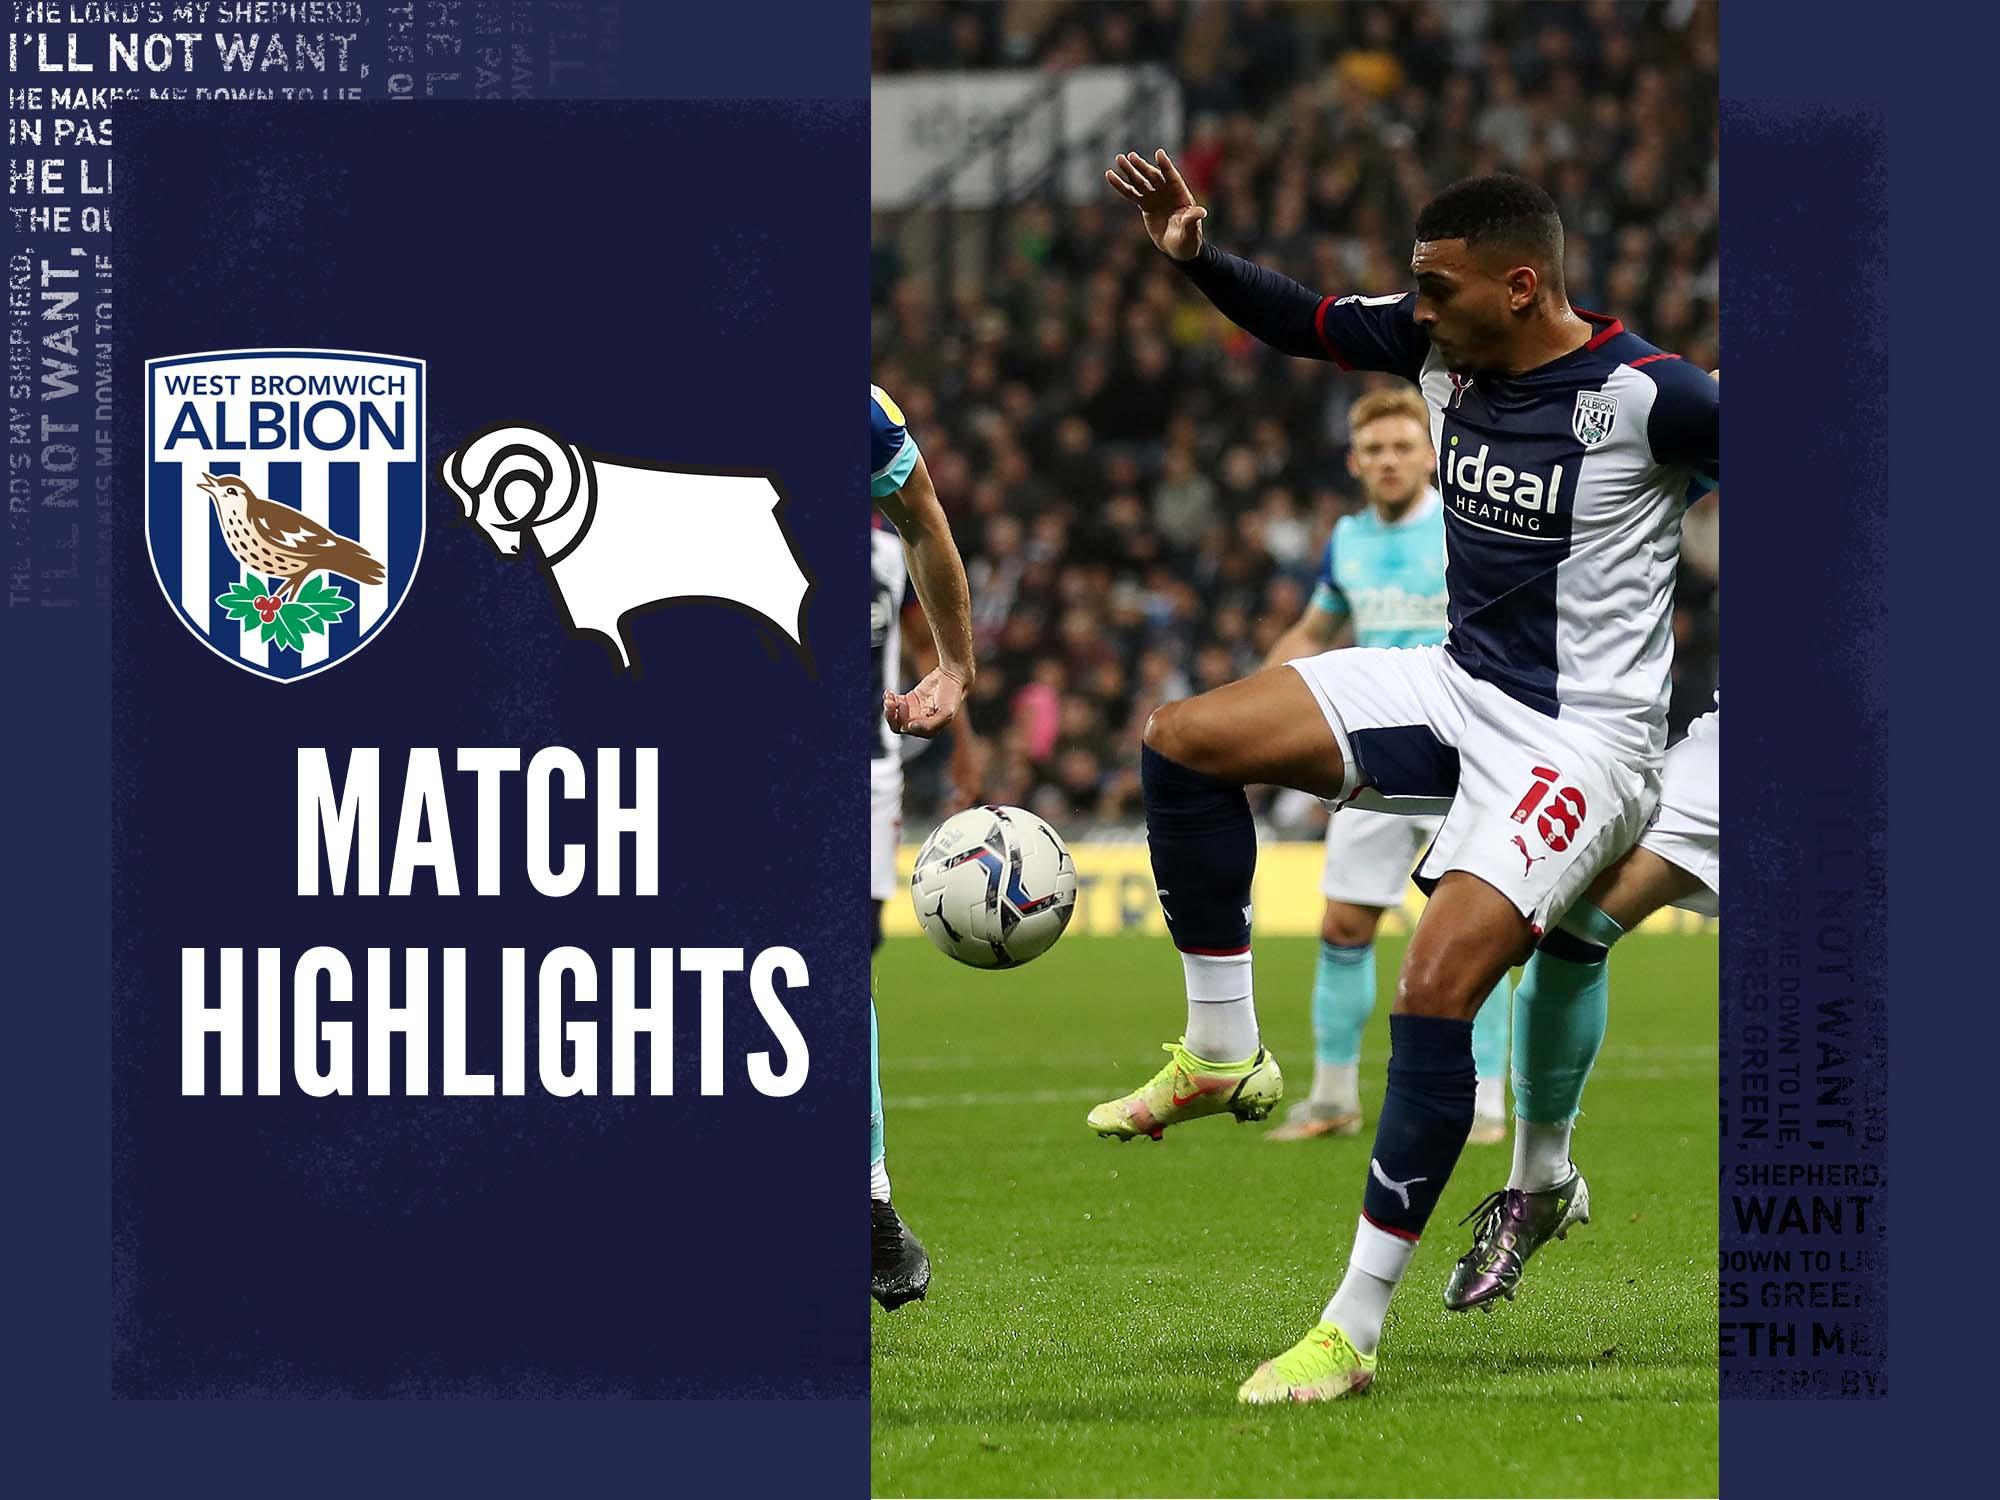 Derby highlights